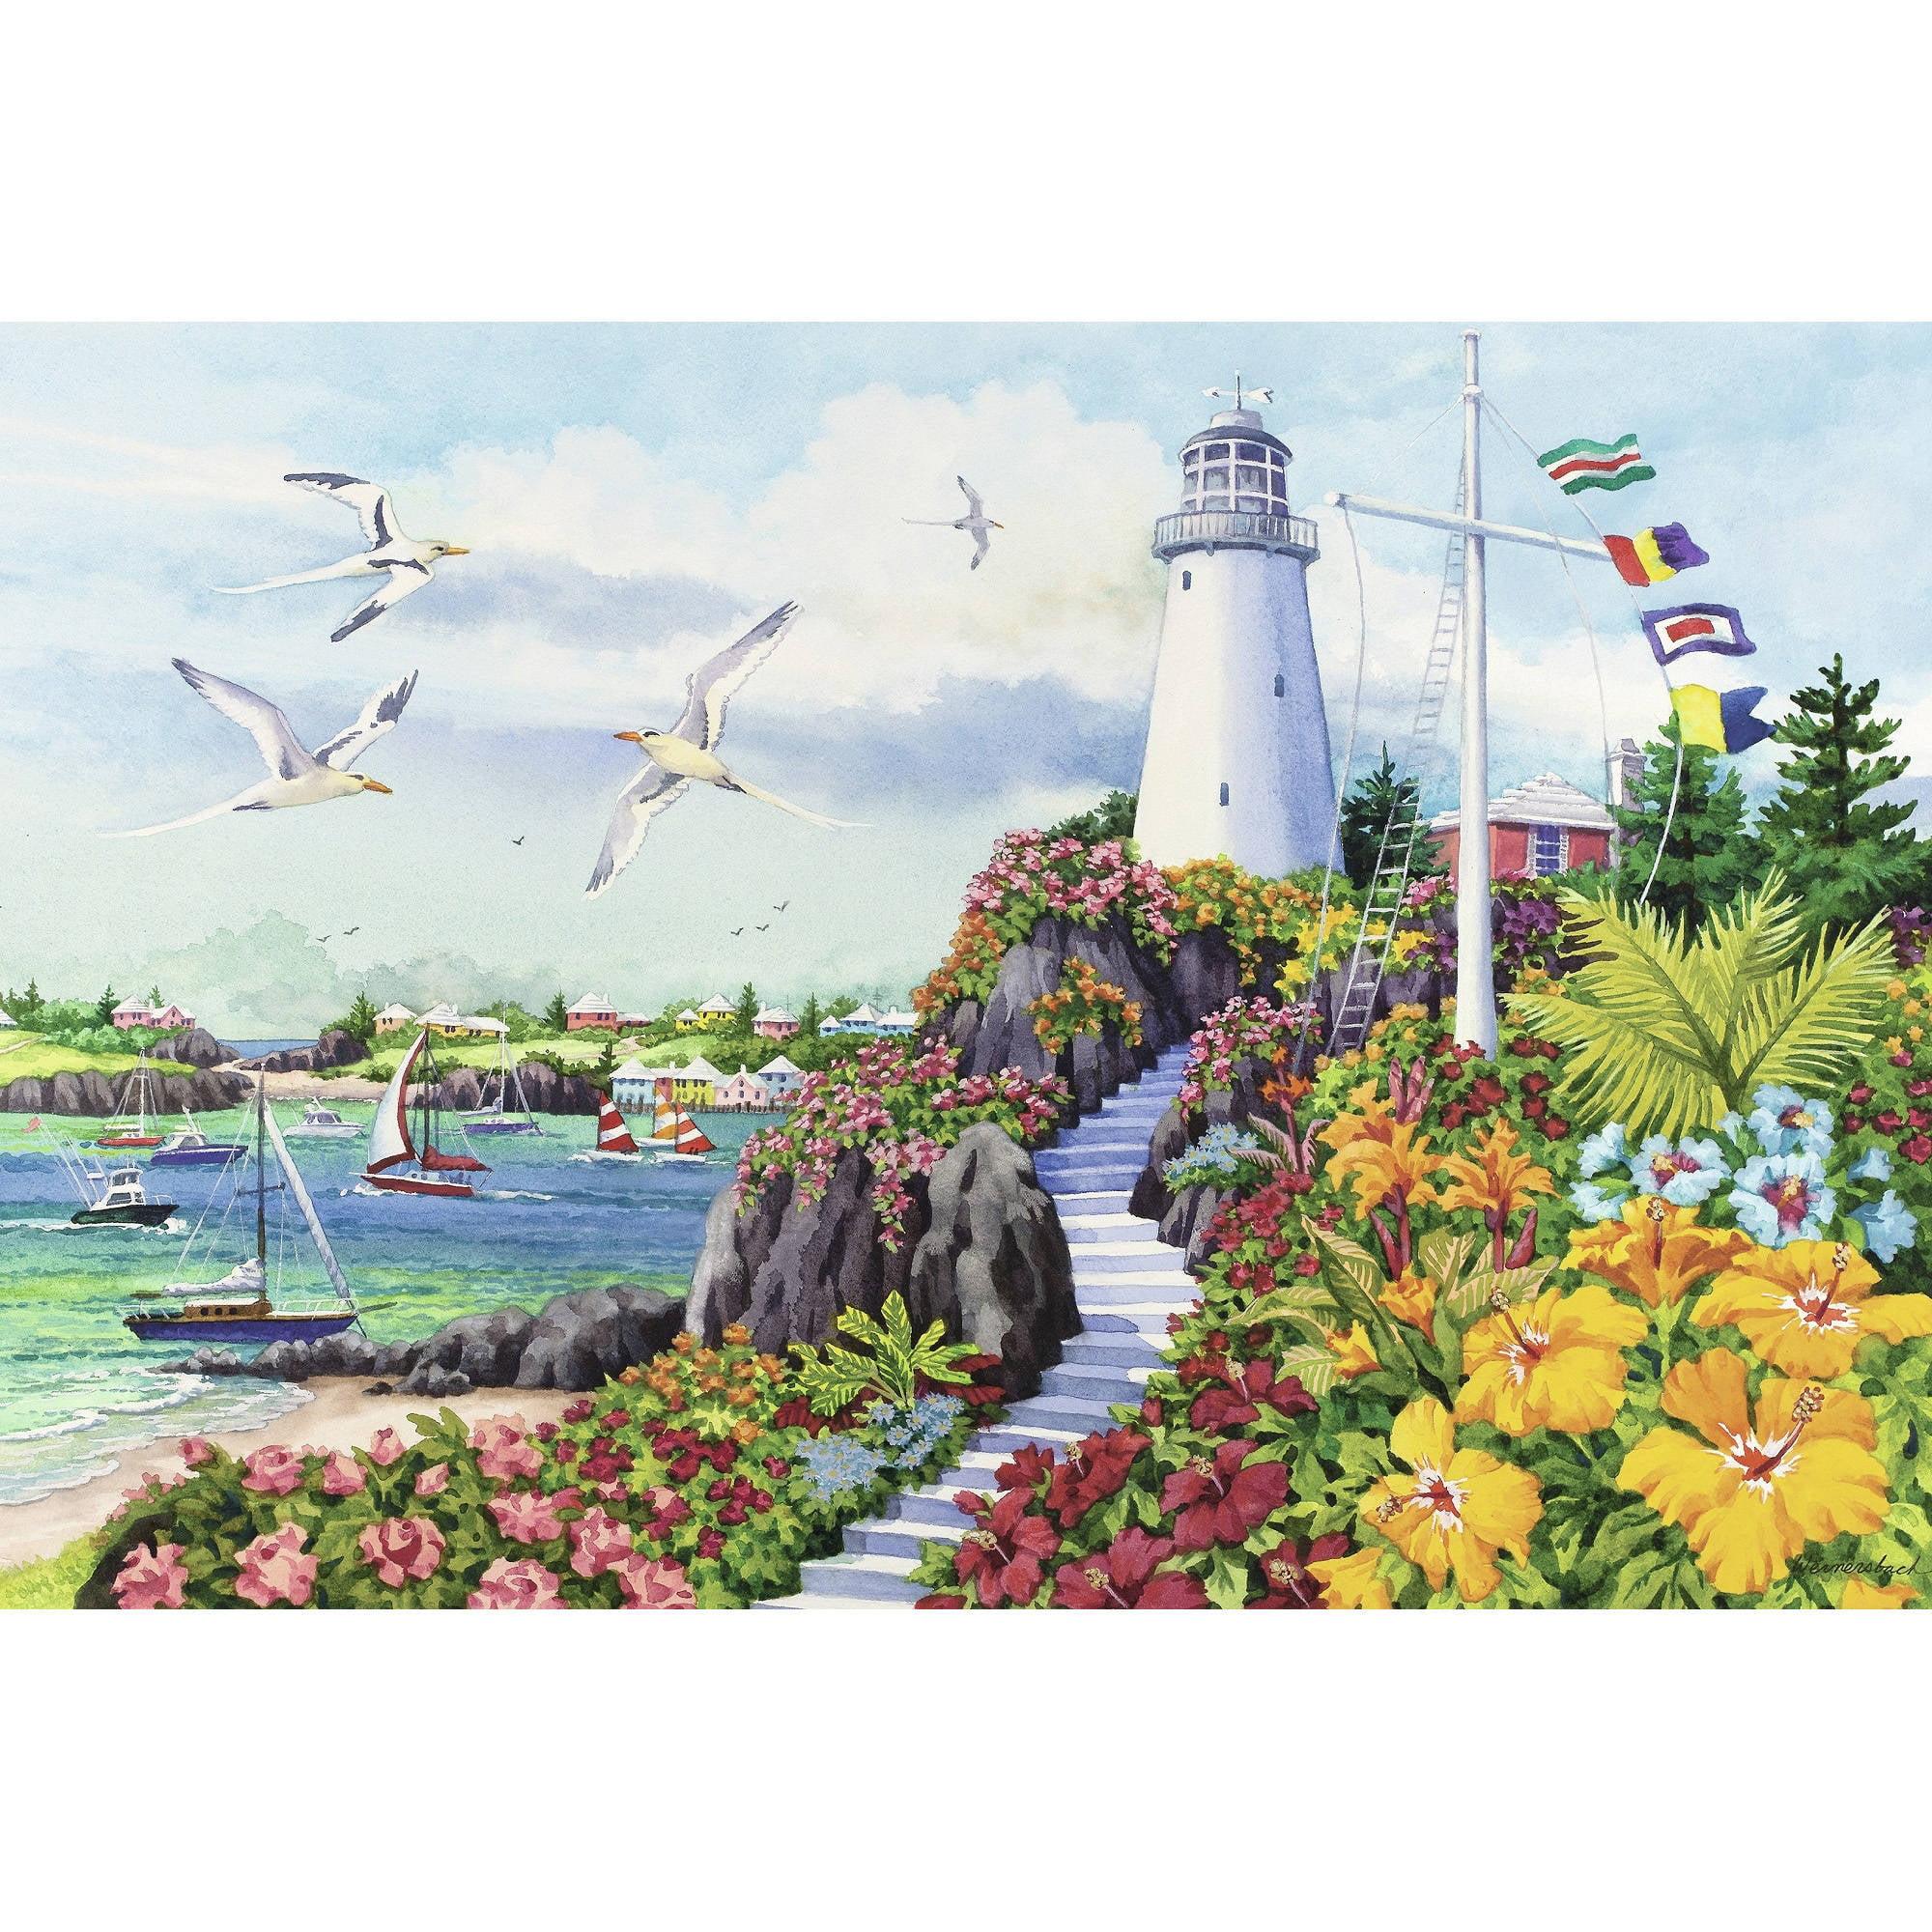 Ravensburger Coastal Paradise 3000 Piece Puzzle by Ravensburger USA Inc